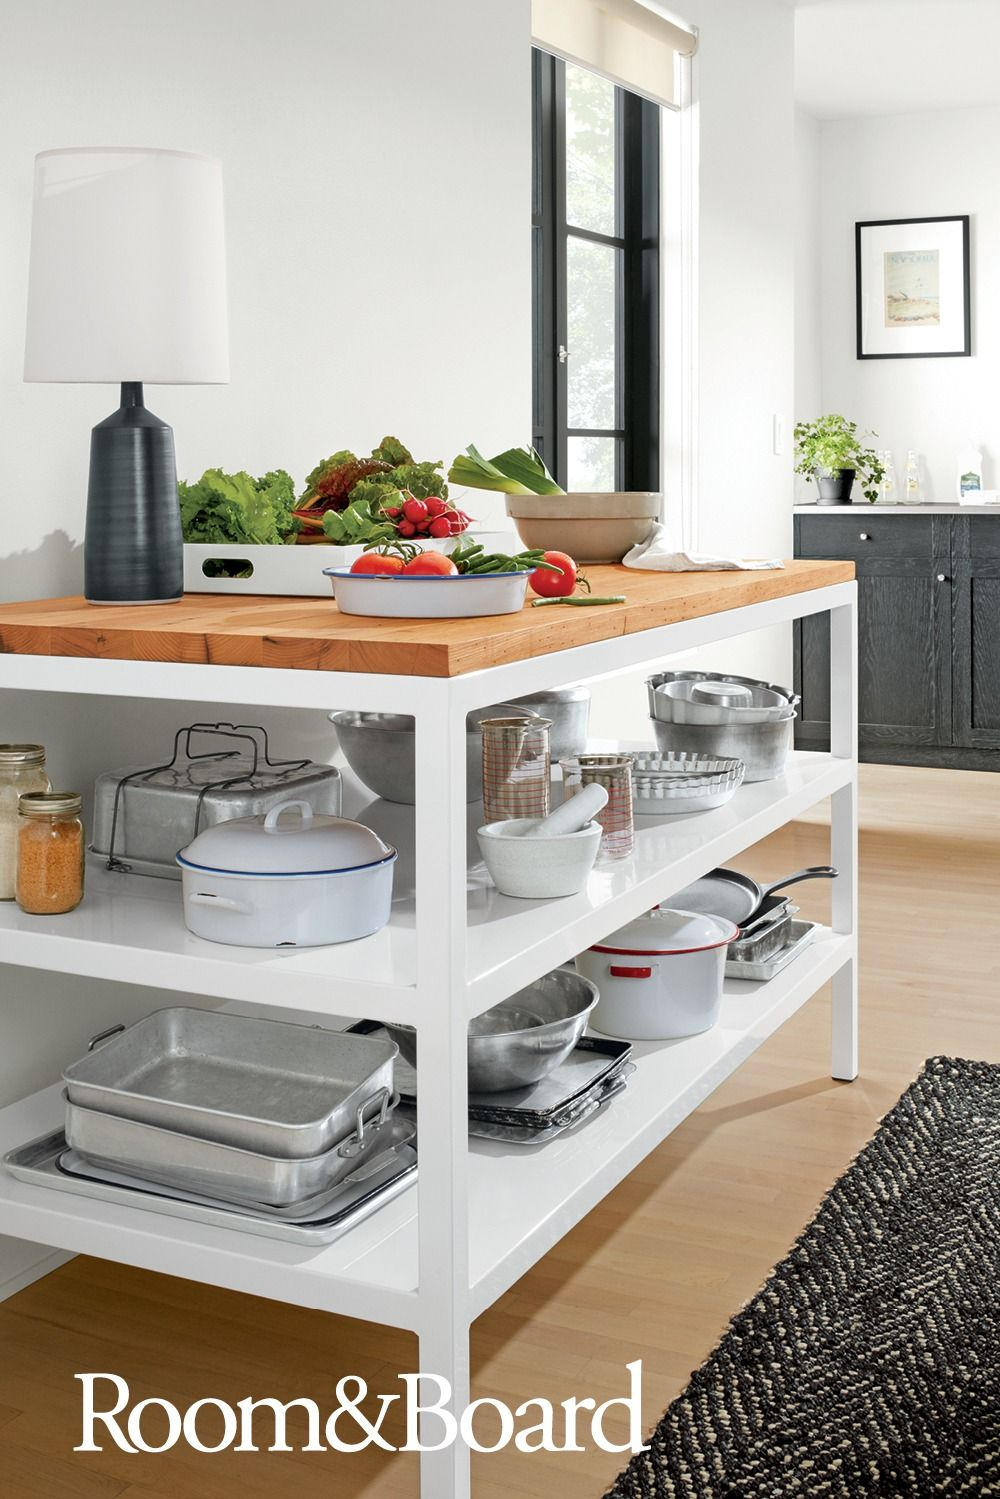 Pratt Counter Tables With Shelves Modern Kitchen Islands Modern Dining Room Kitchen Furniture Room Board Modern Kitchen Kitchen Dining Room Kitchen Furniture